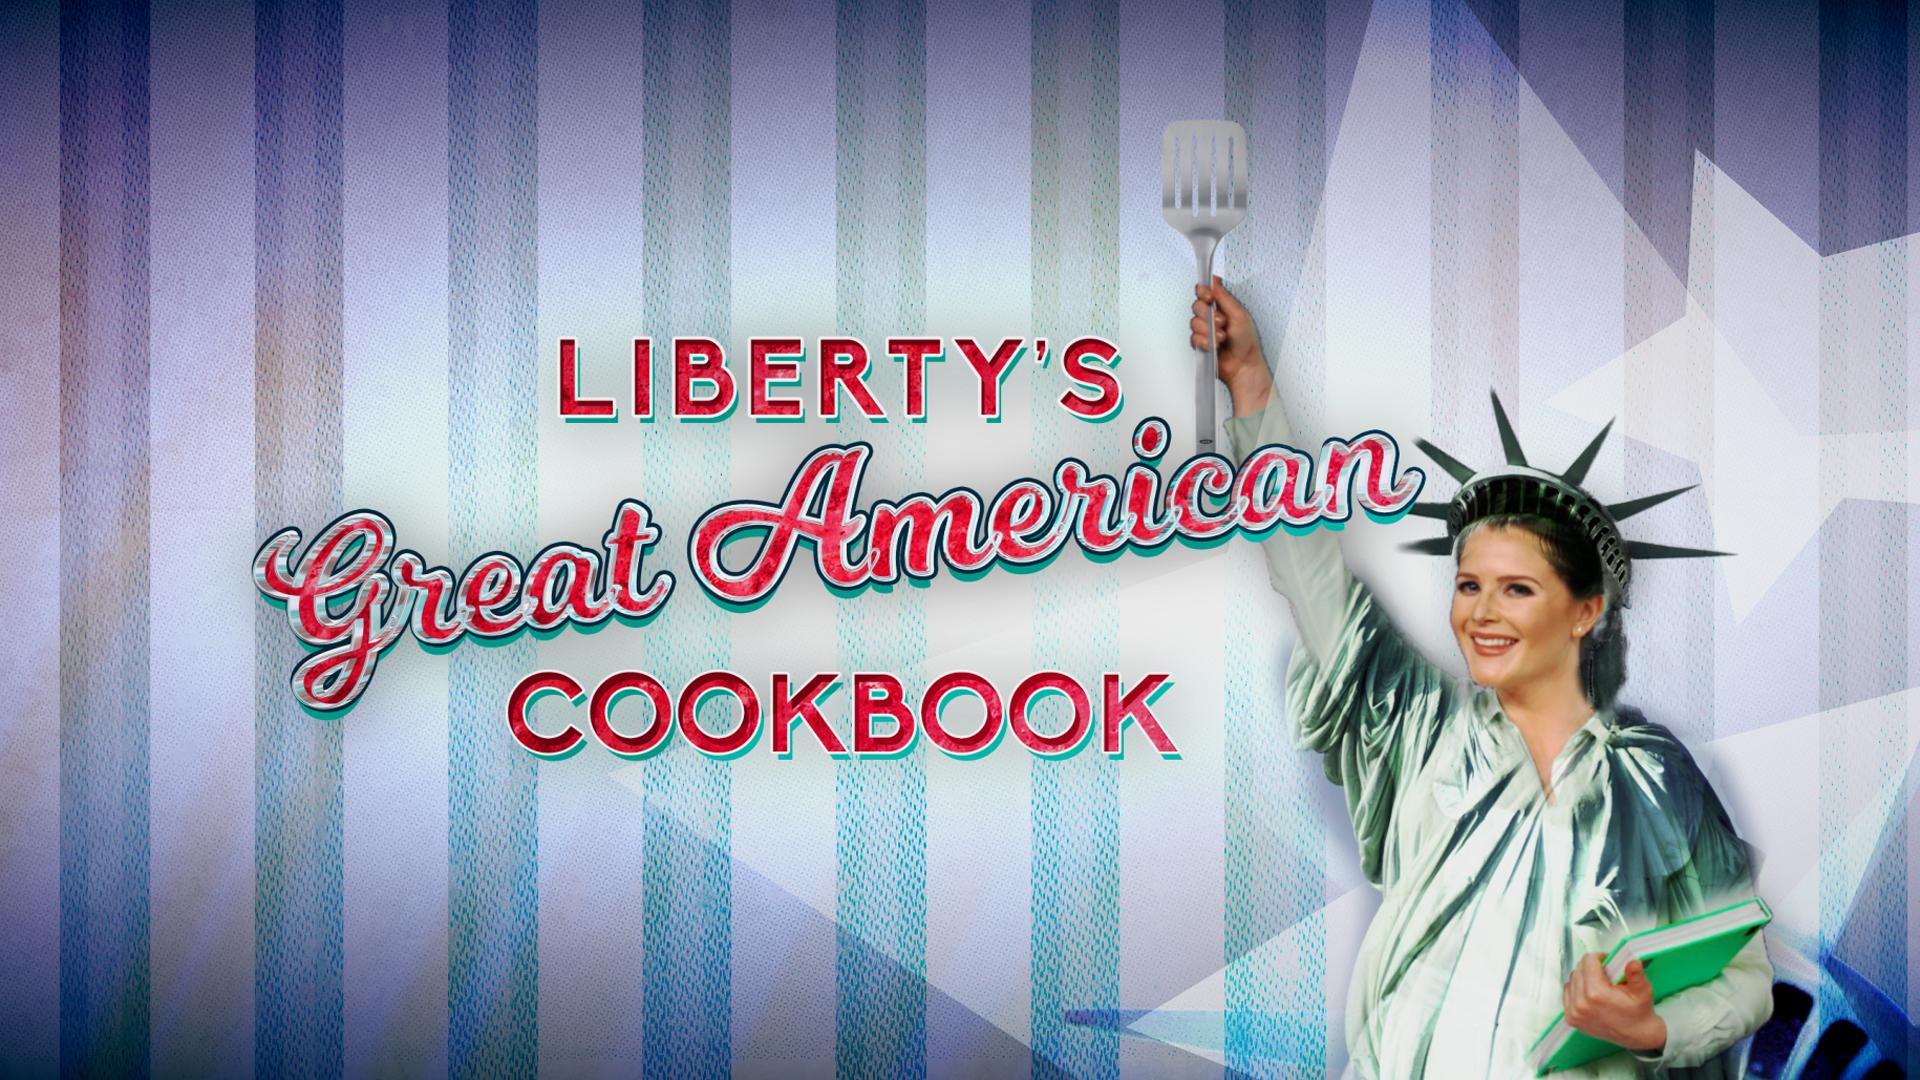 Liberty's Great American Cookbook